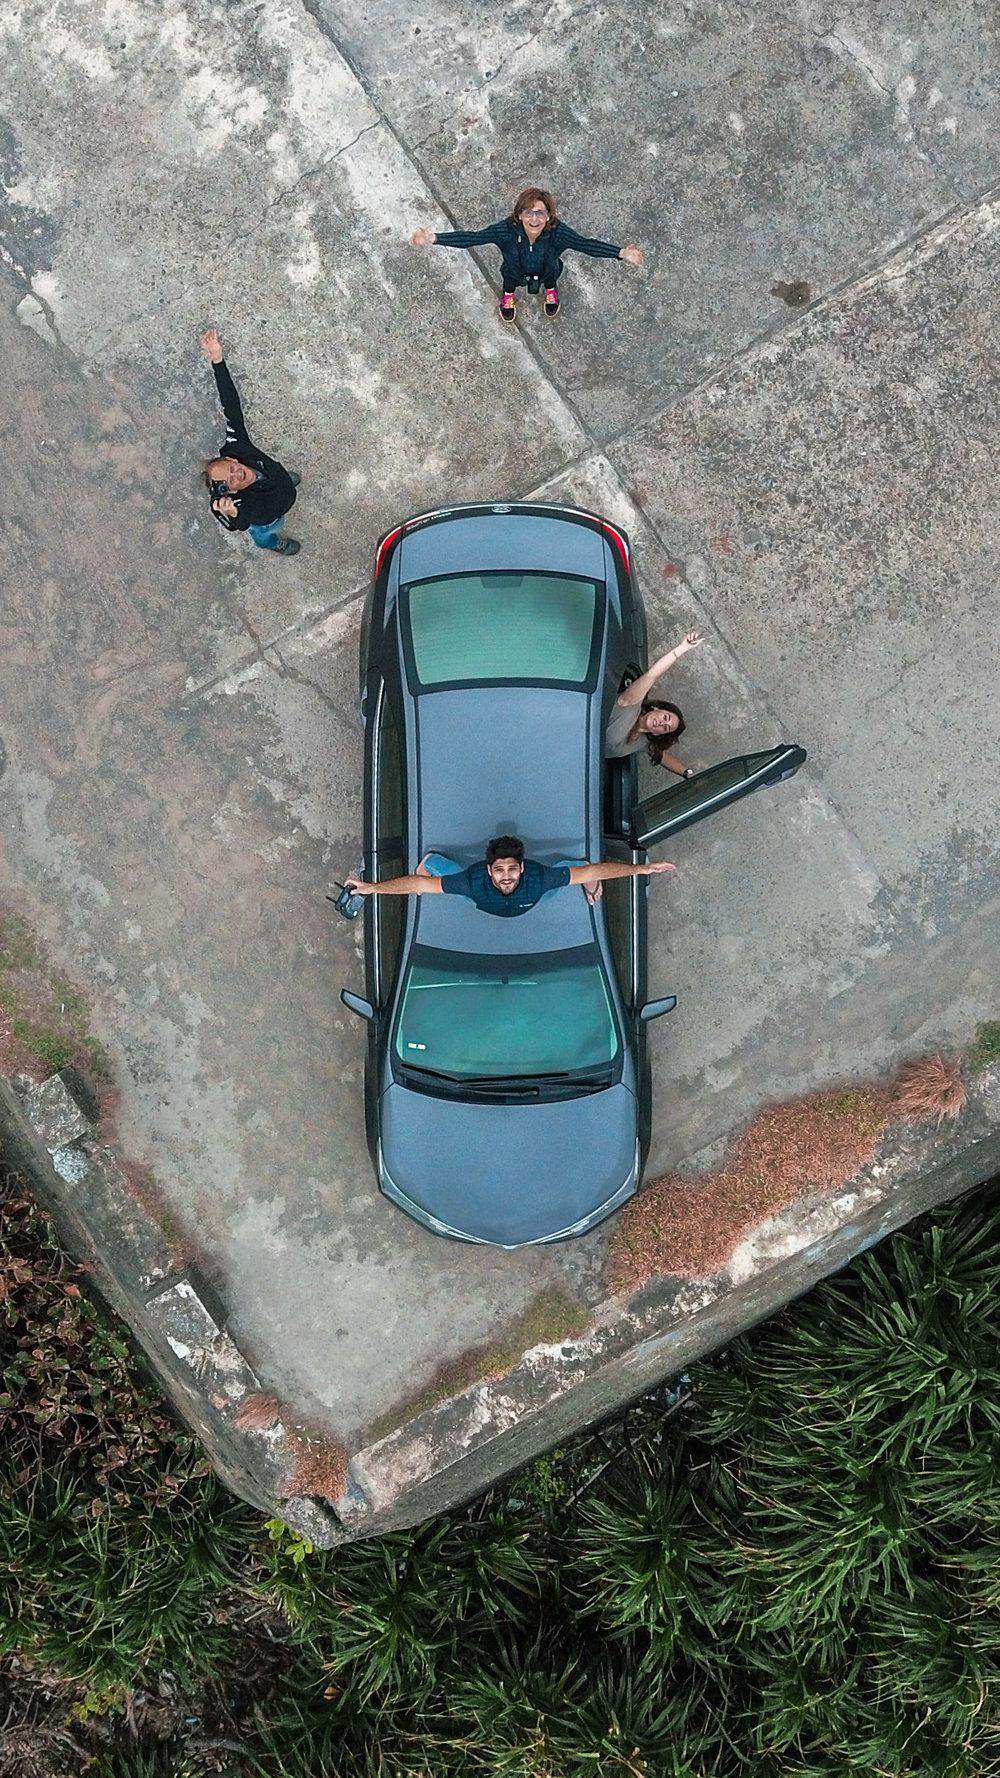 pol_tarres_adventures_taiwan_verticals-01.jpg